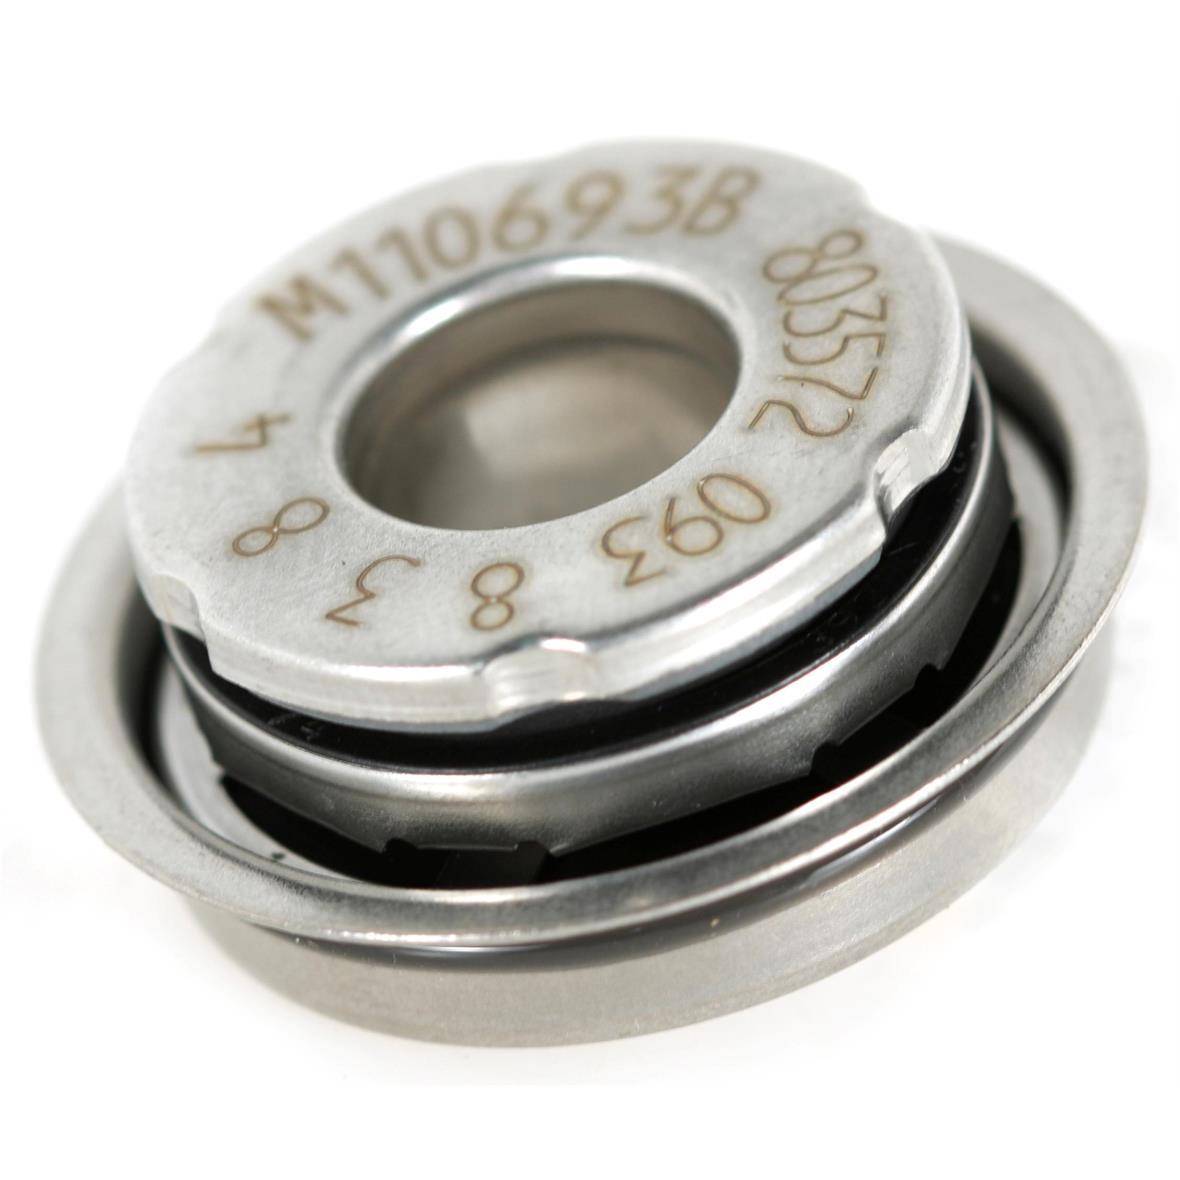 Product Image for 'Gasket cog water pumpTitle'